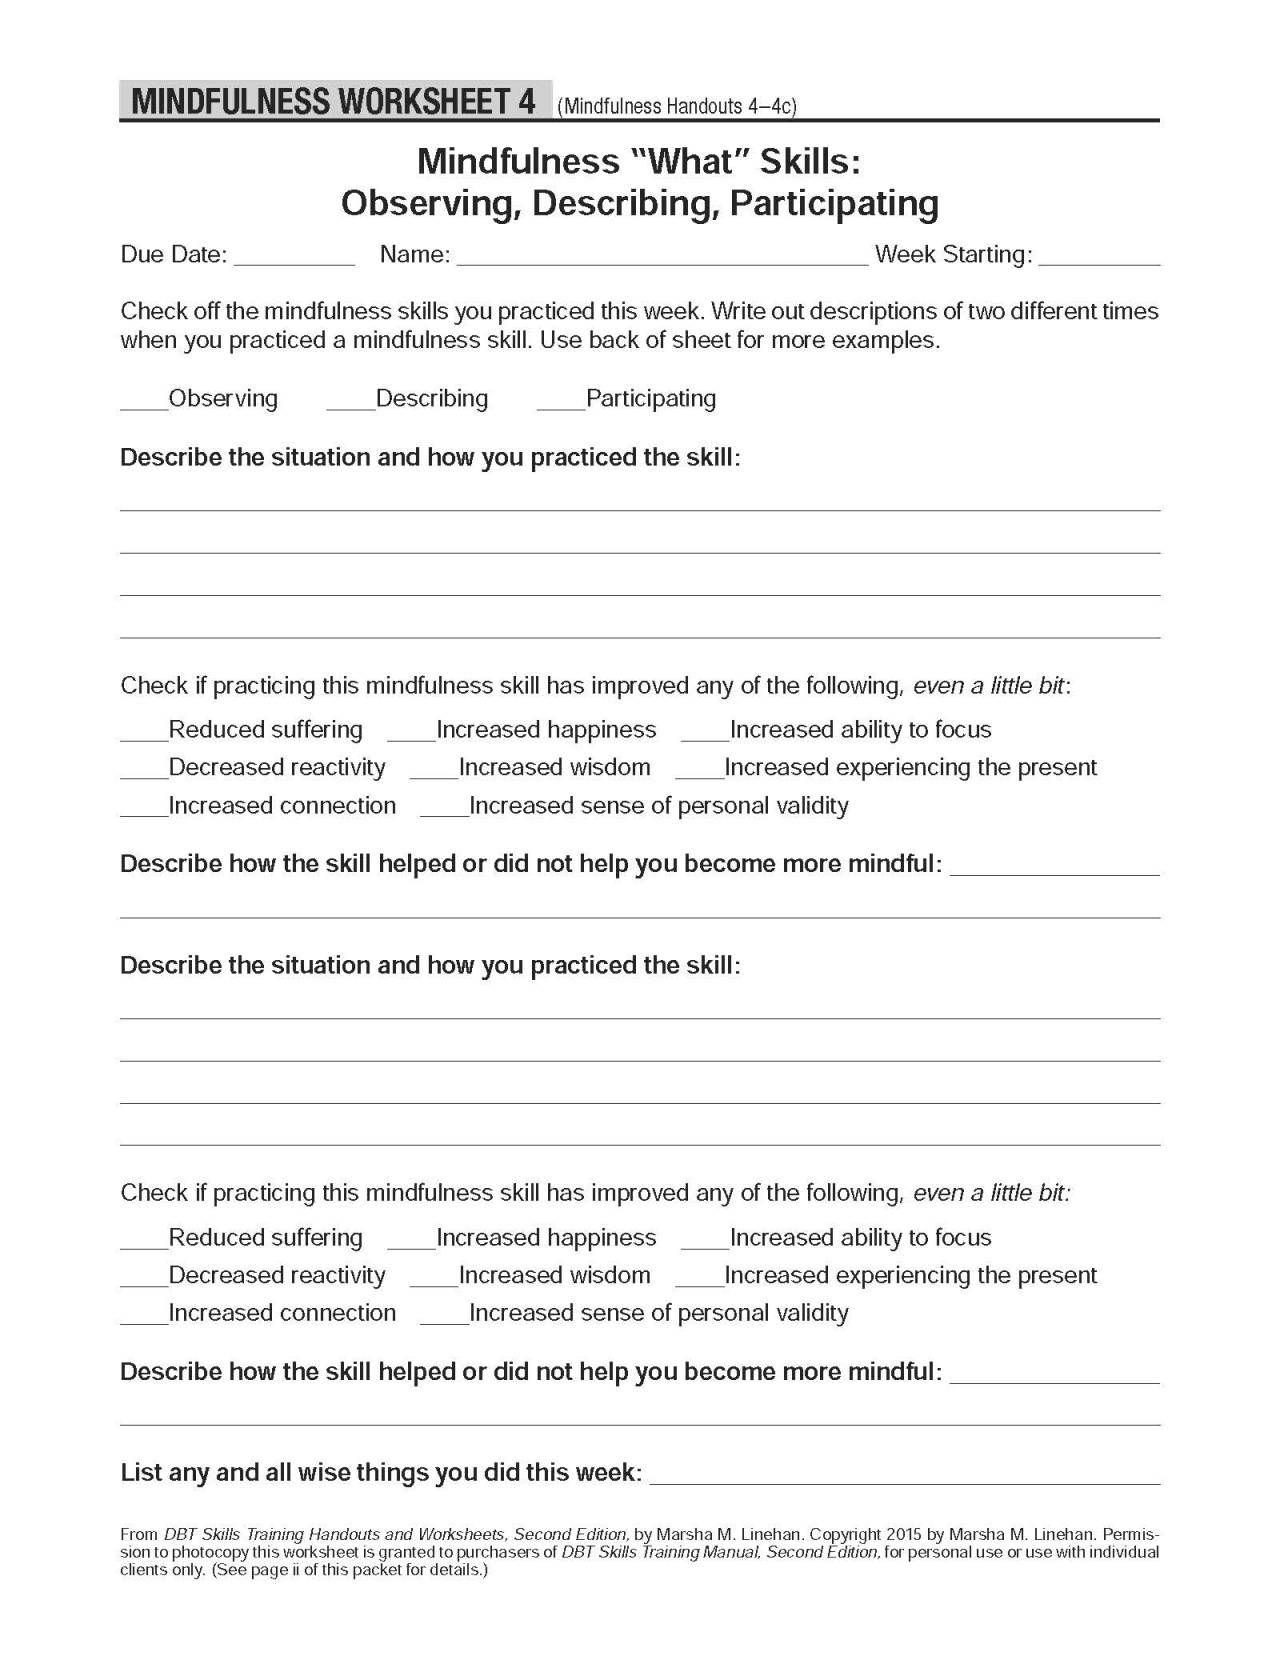 Dbt Skills Training Handouts And Worksheets Free